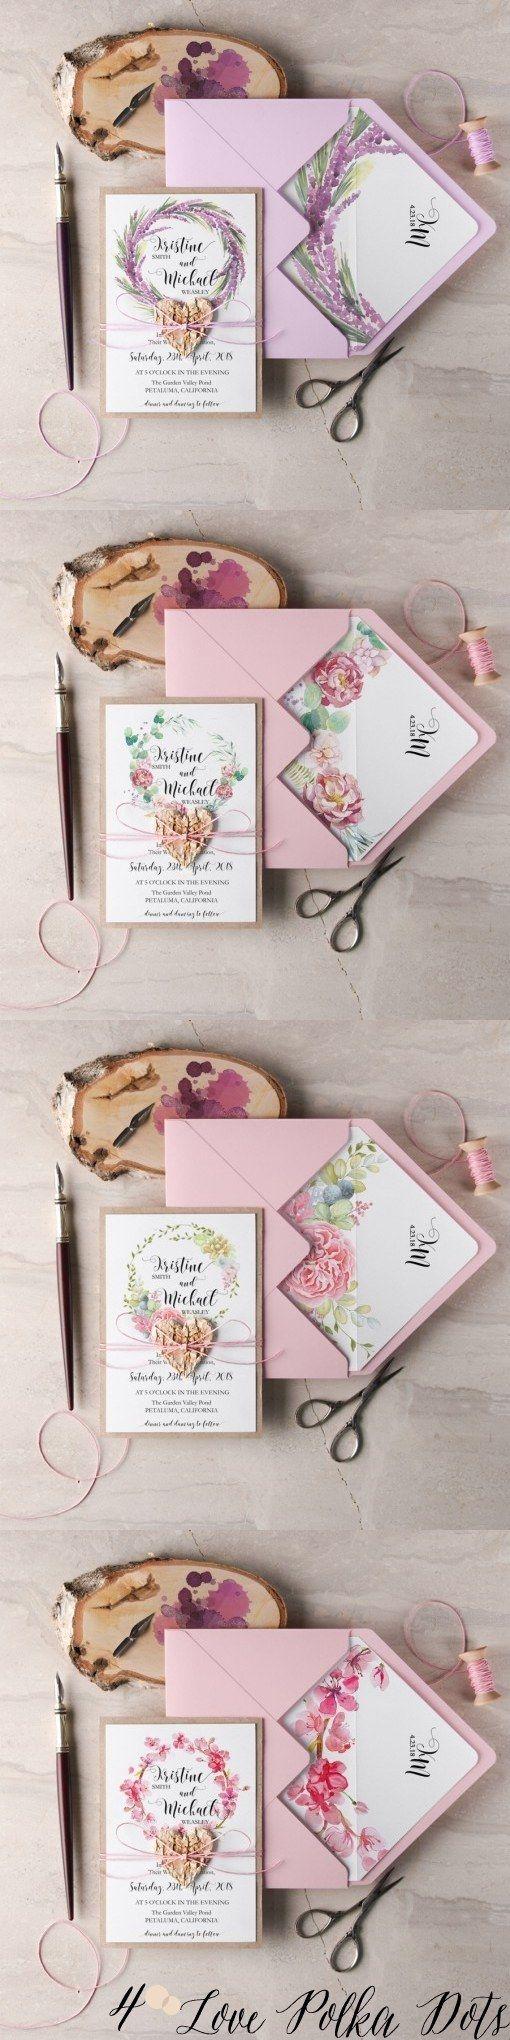 pink watercolor flower wreath wedding invitations #pinkwedding #lavenderwedding #purplewedding